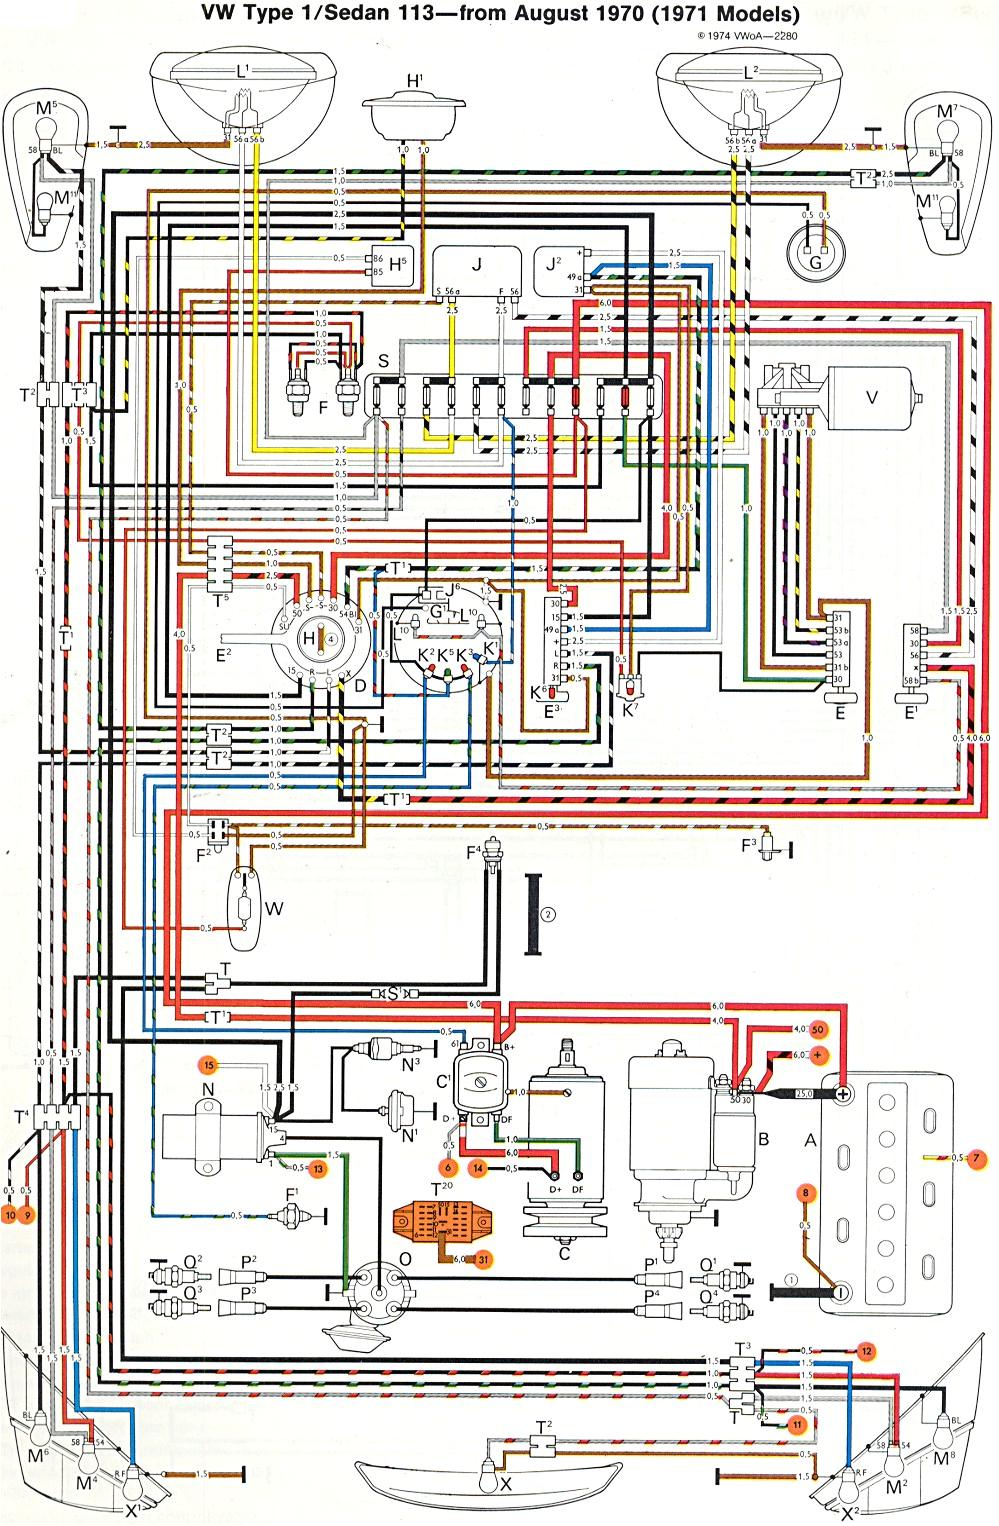 wiring diagram further 1974 vw beetle firing order in addition vw 1974 vw beetle firing order diagram